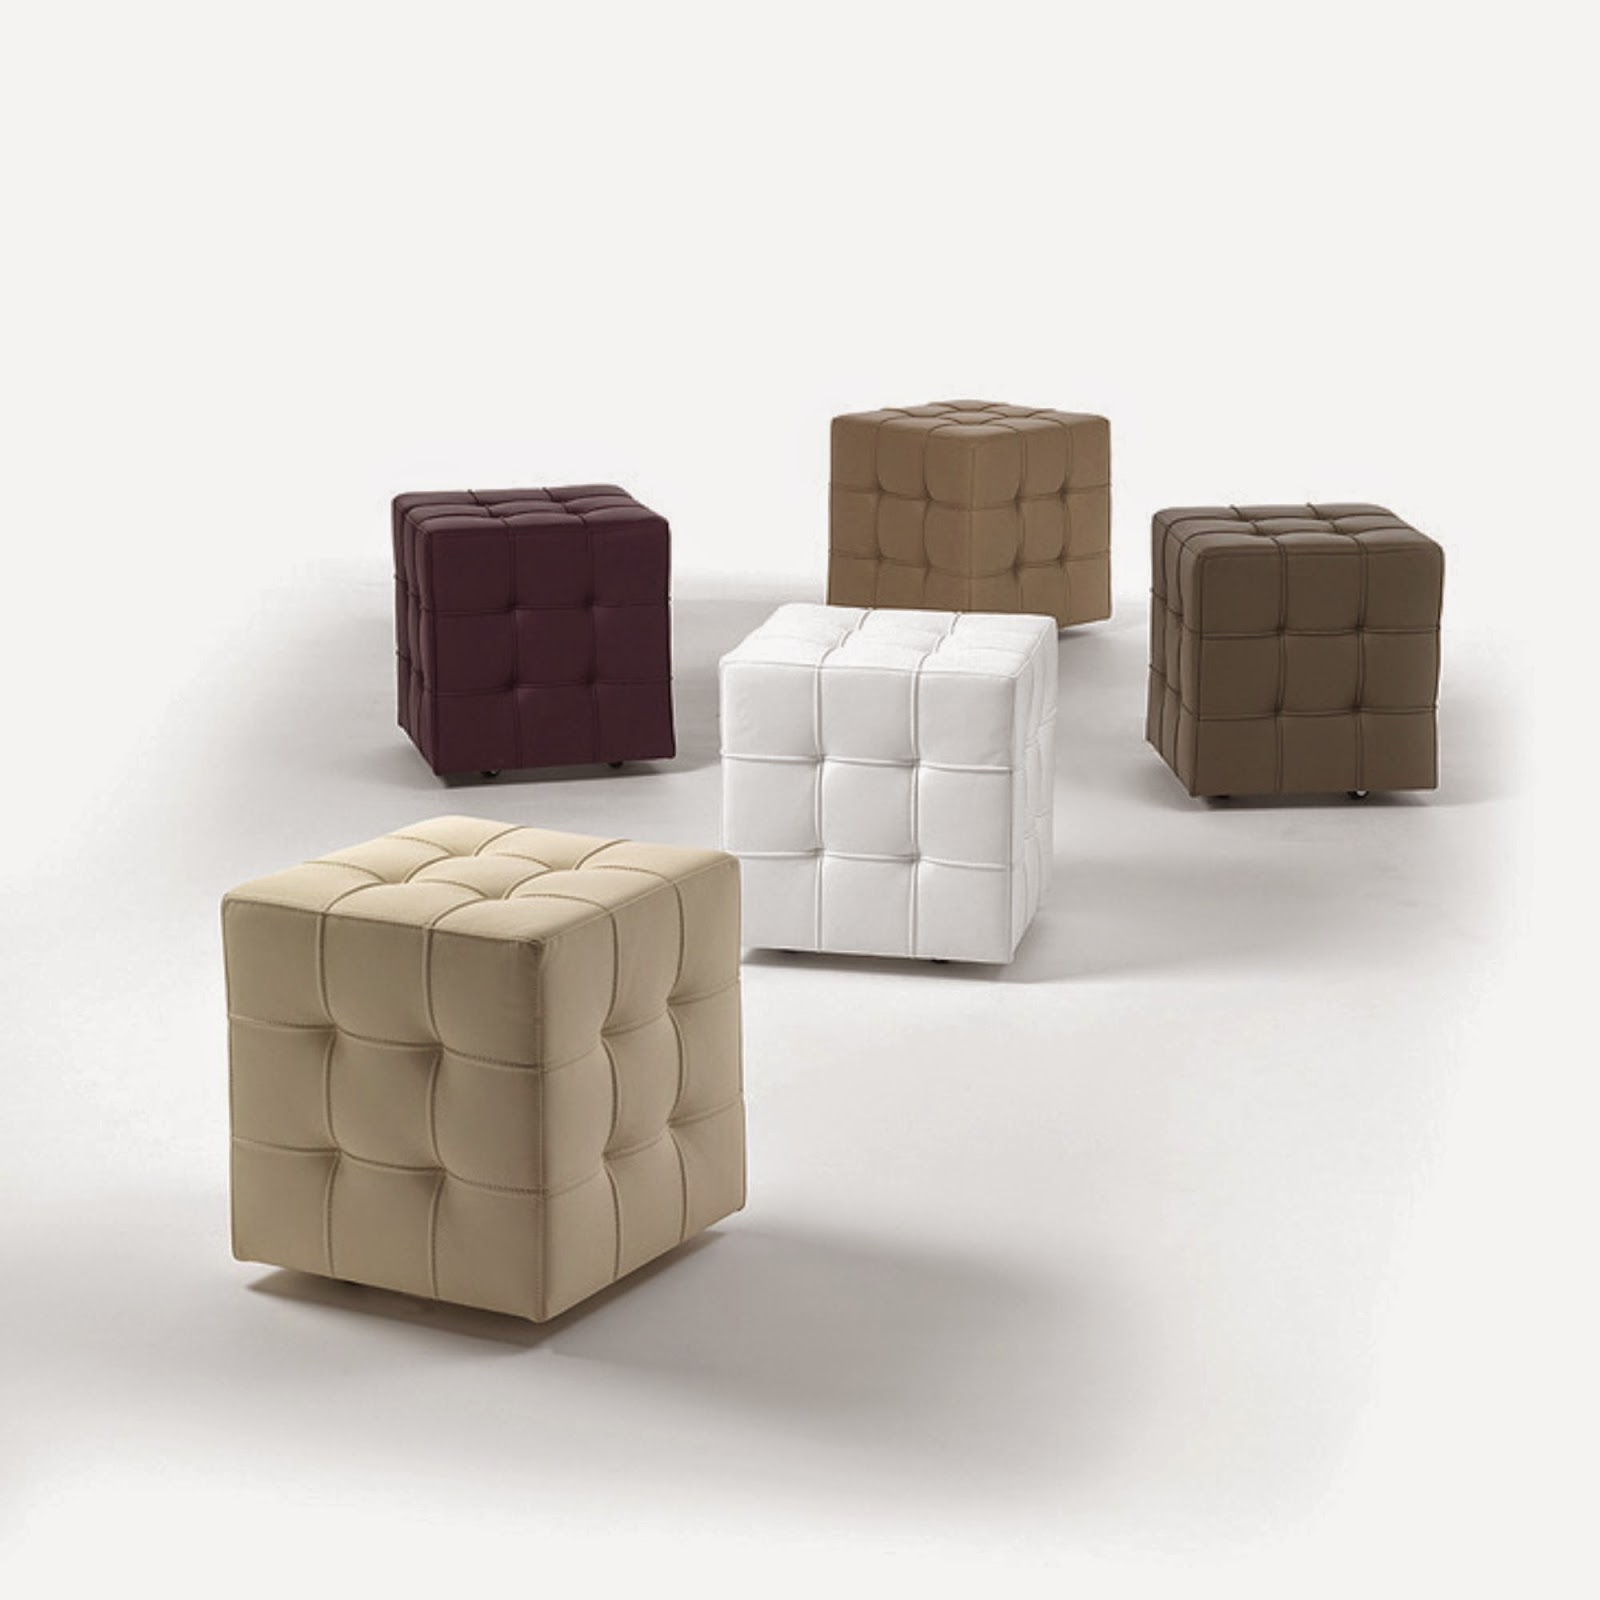 Pouf bob pouff cattelan italia italian furniture for B et b italia